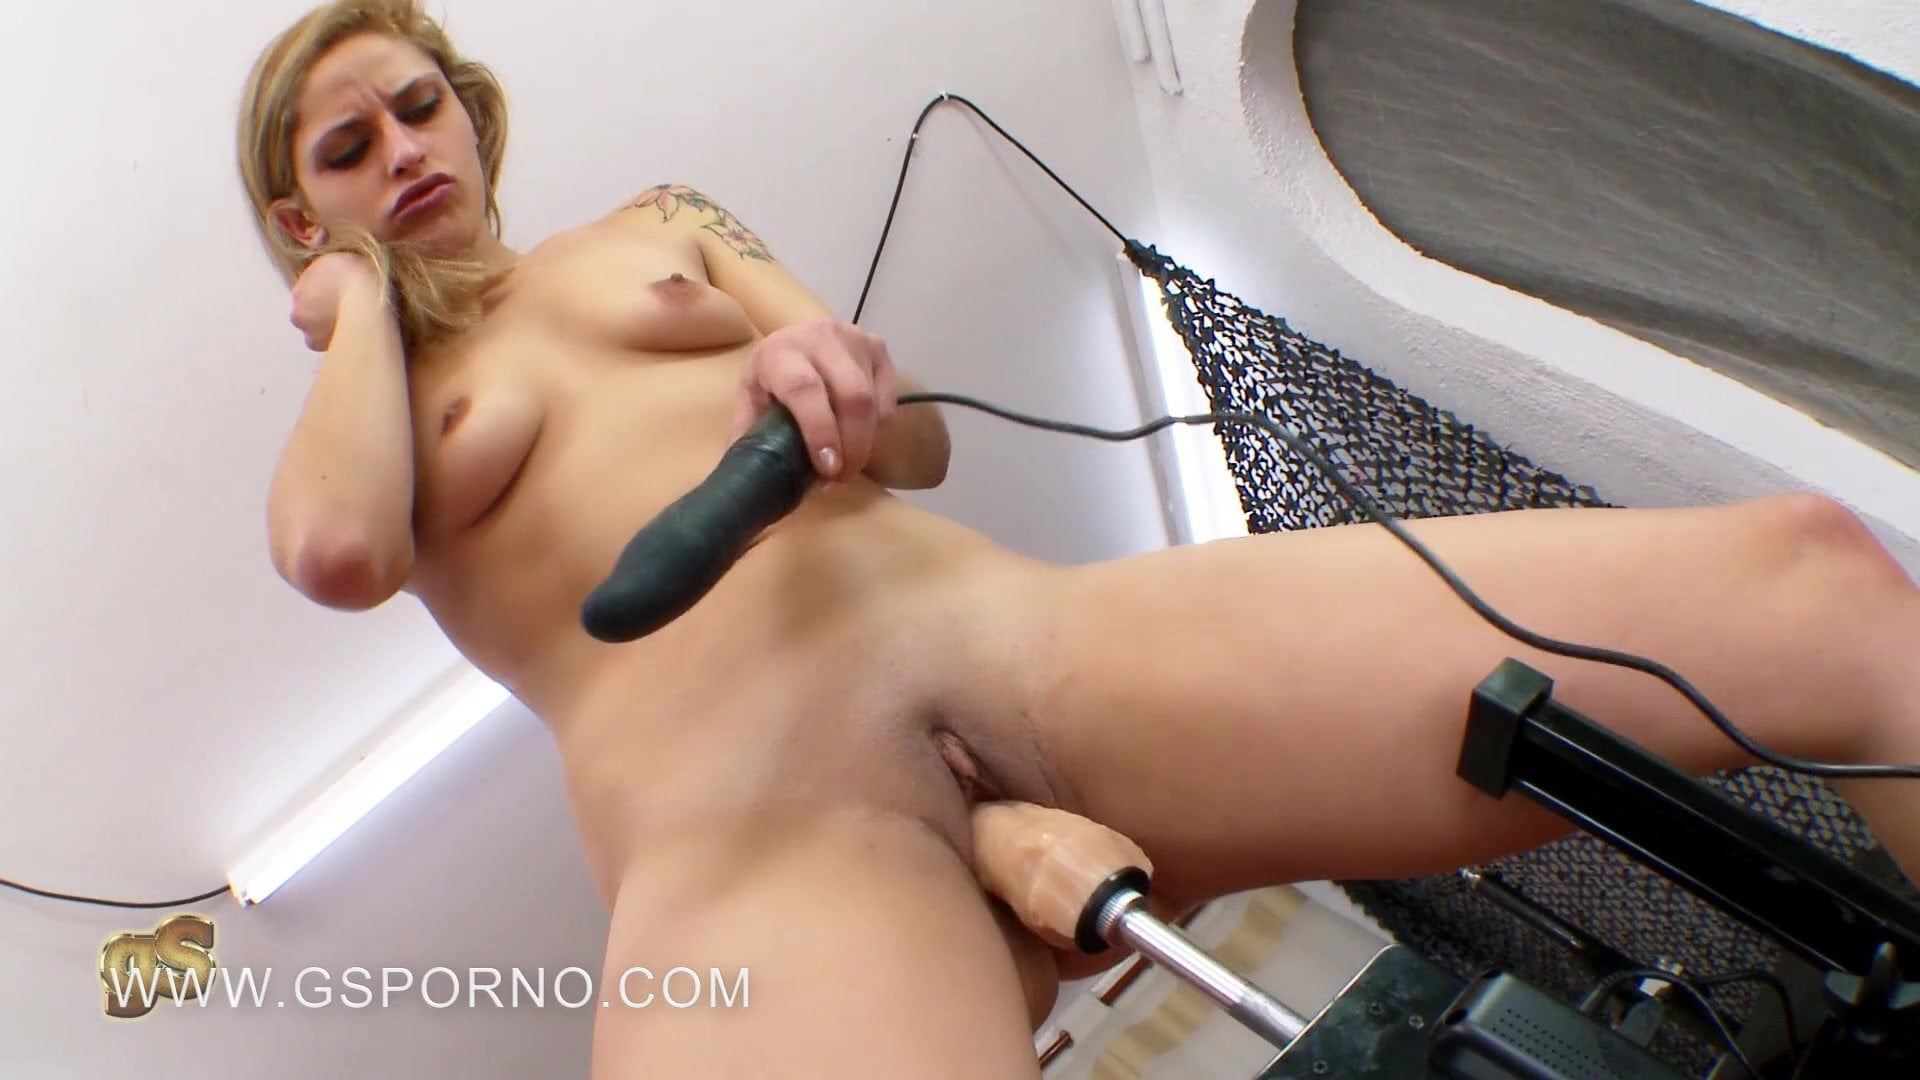 Dildo machine buy hq porn pics